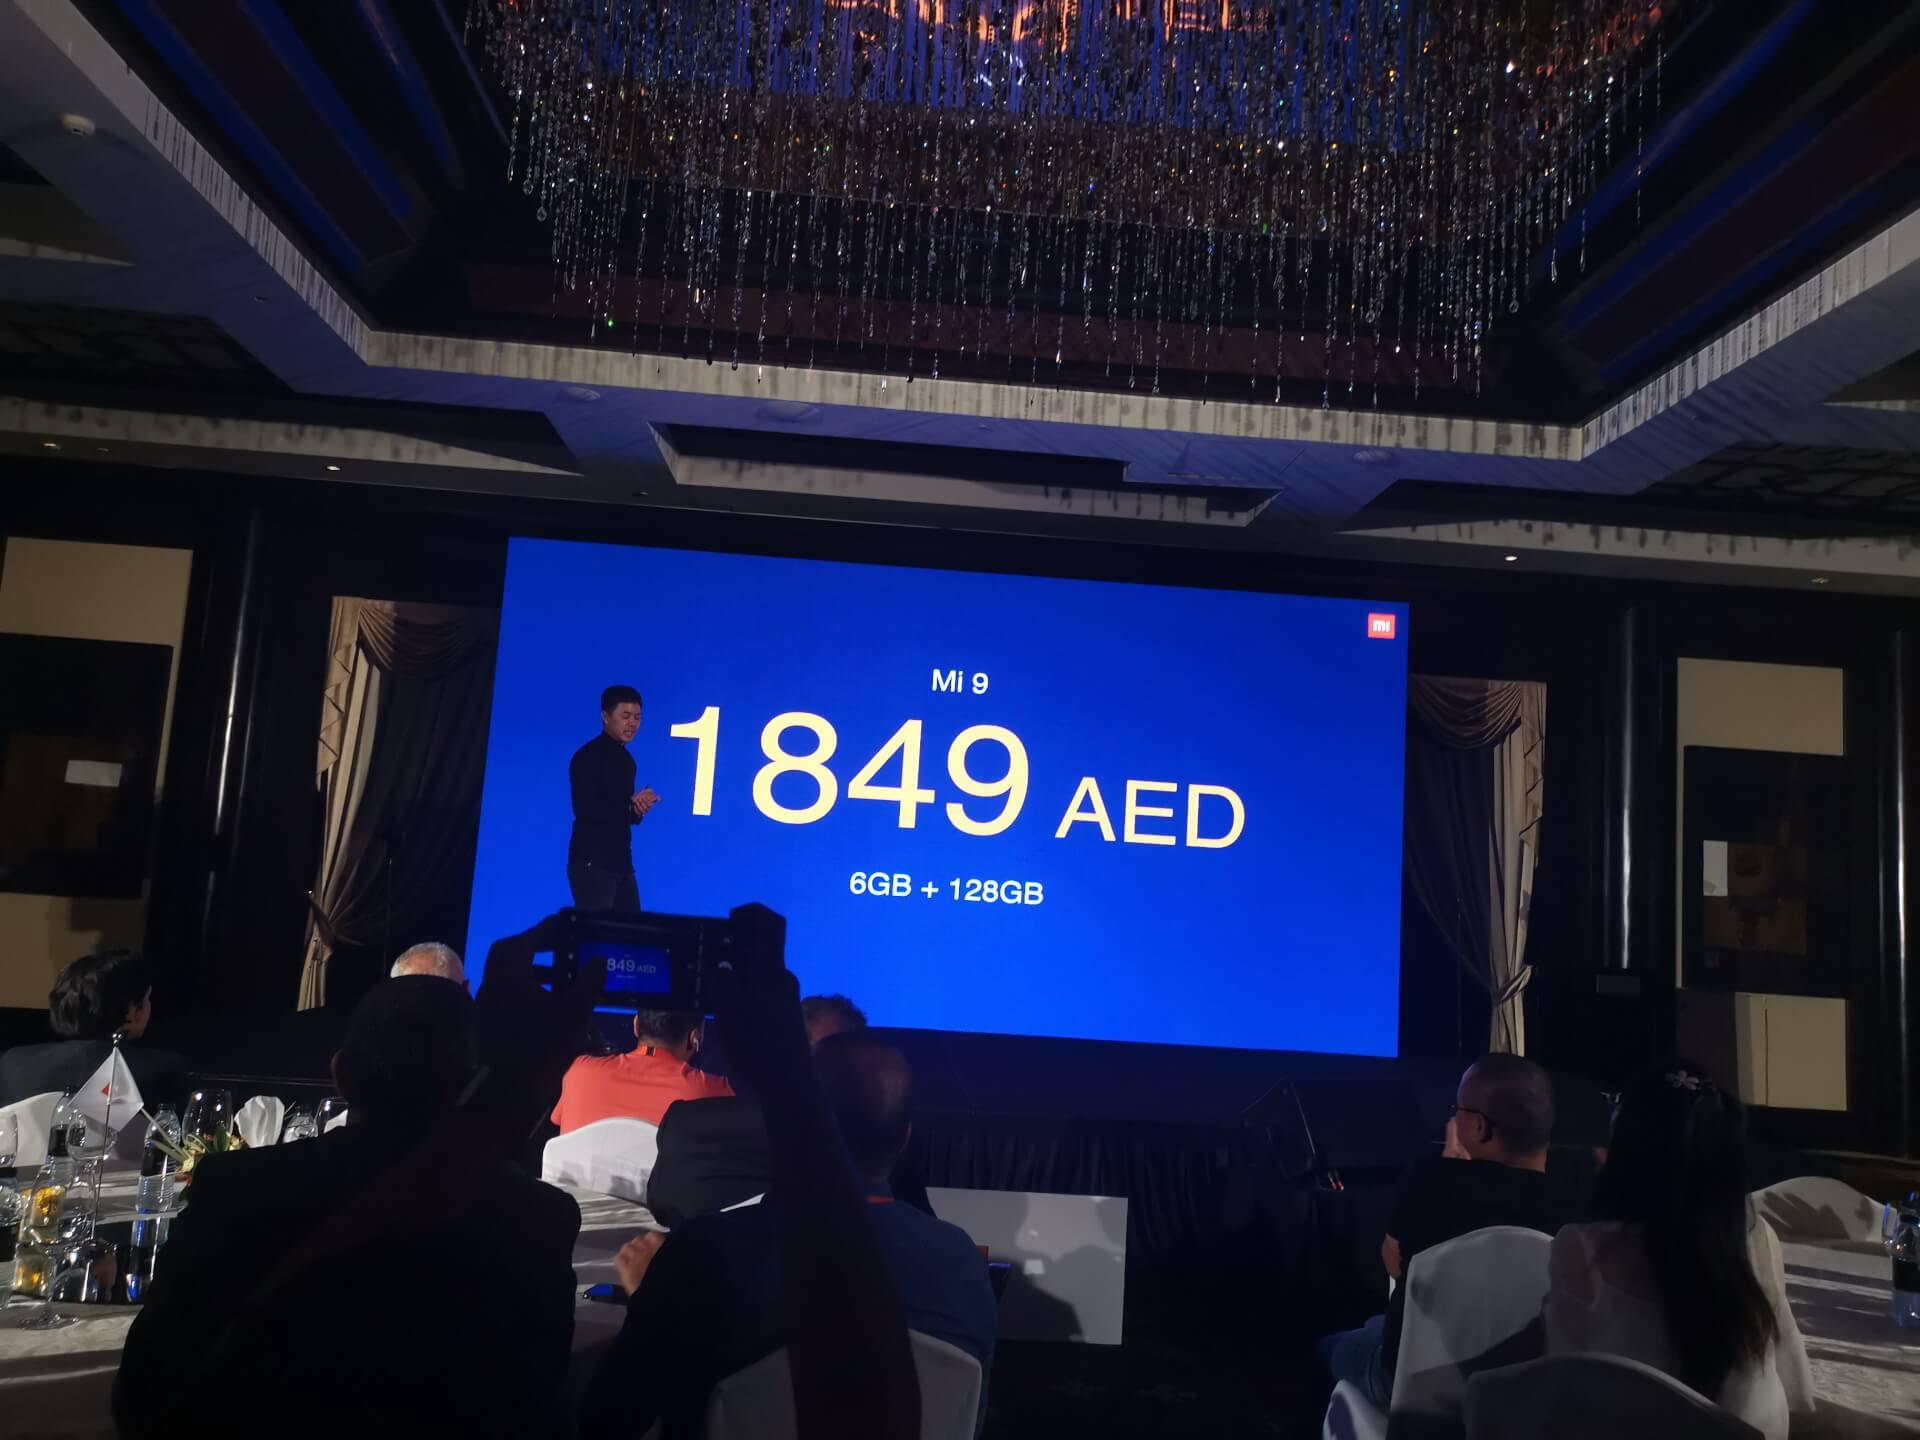 سعر ومواصفات هاتف Xiaomi Mi 9 الجديد